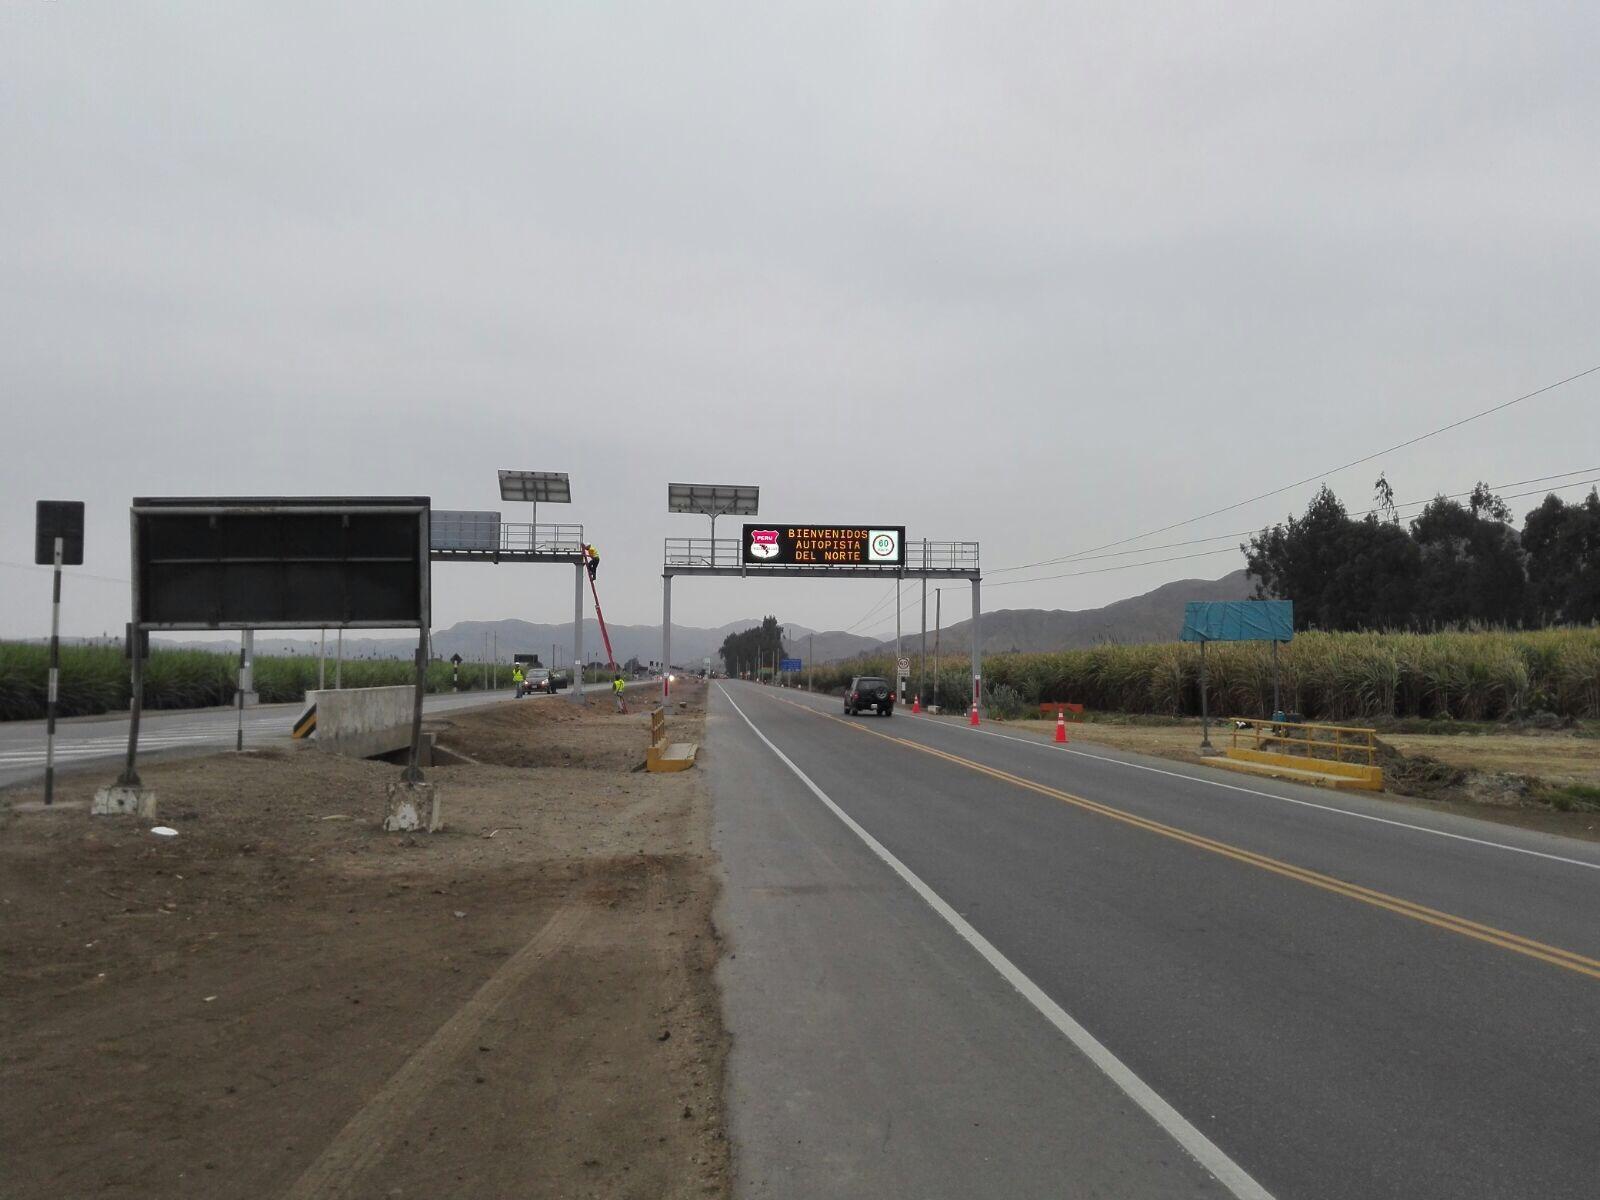 Tecnivial paneles de mensaje variable en Perú